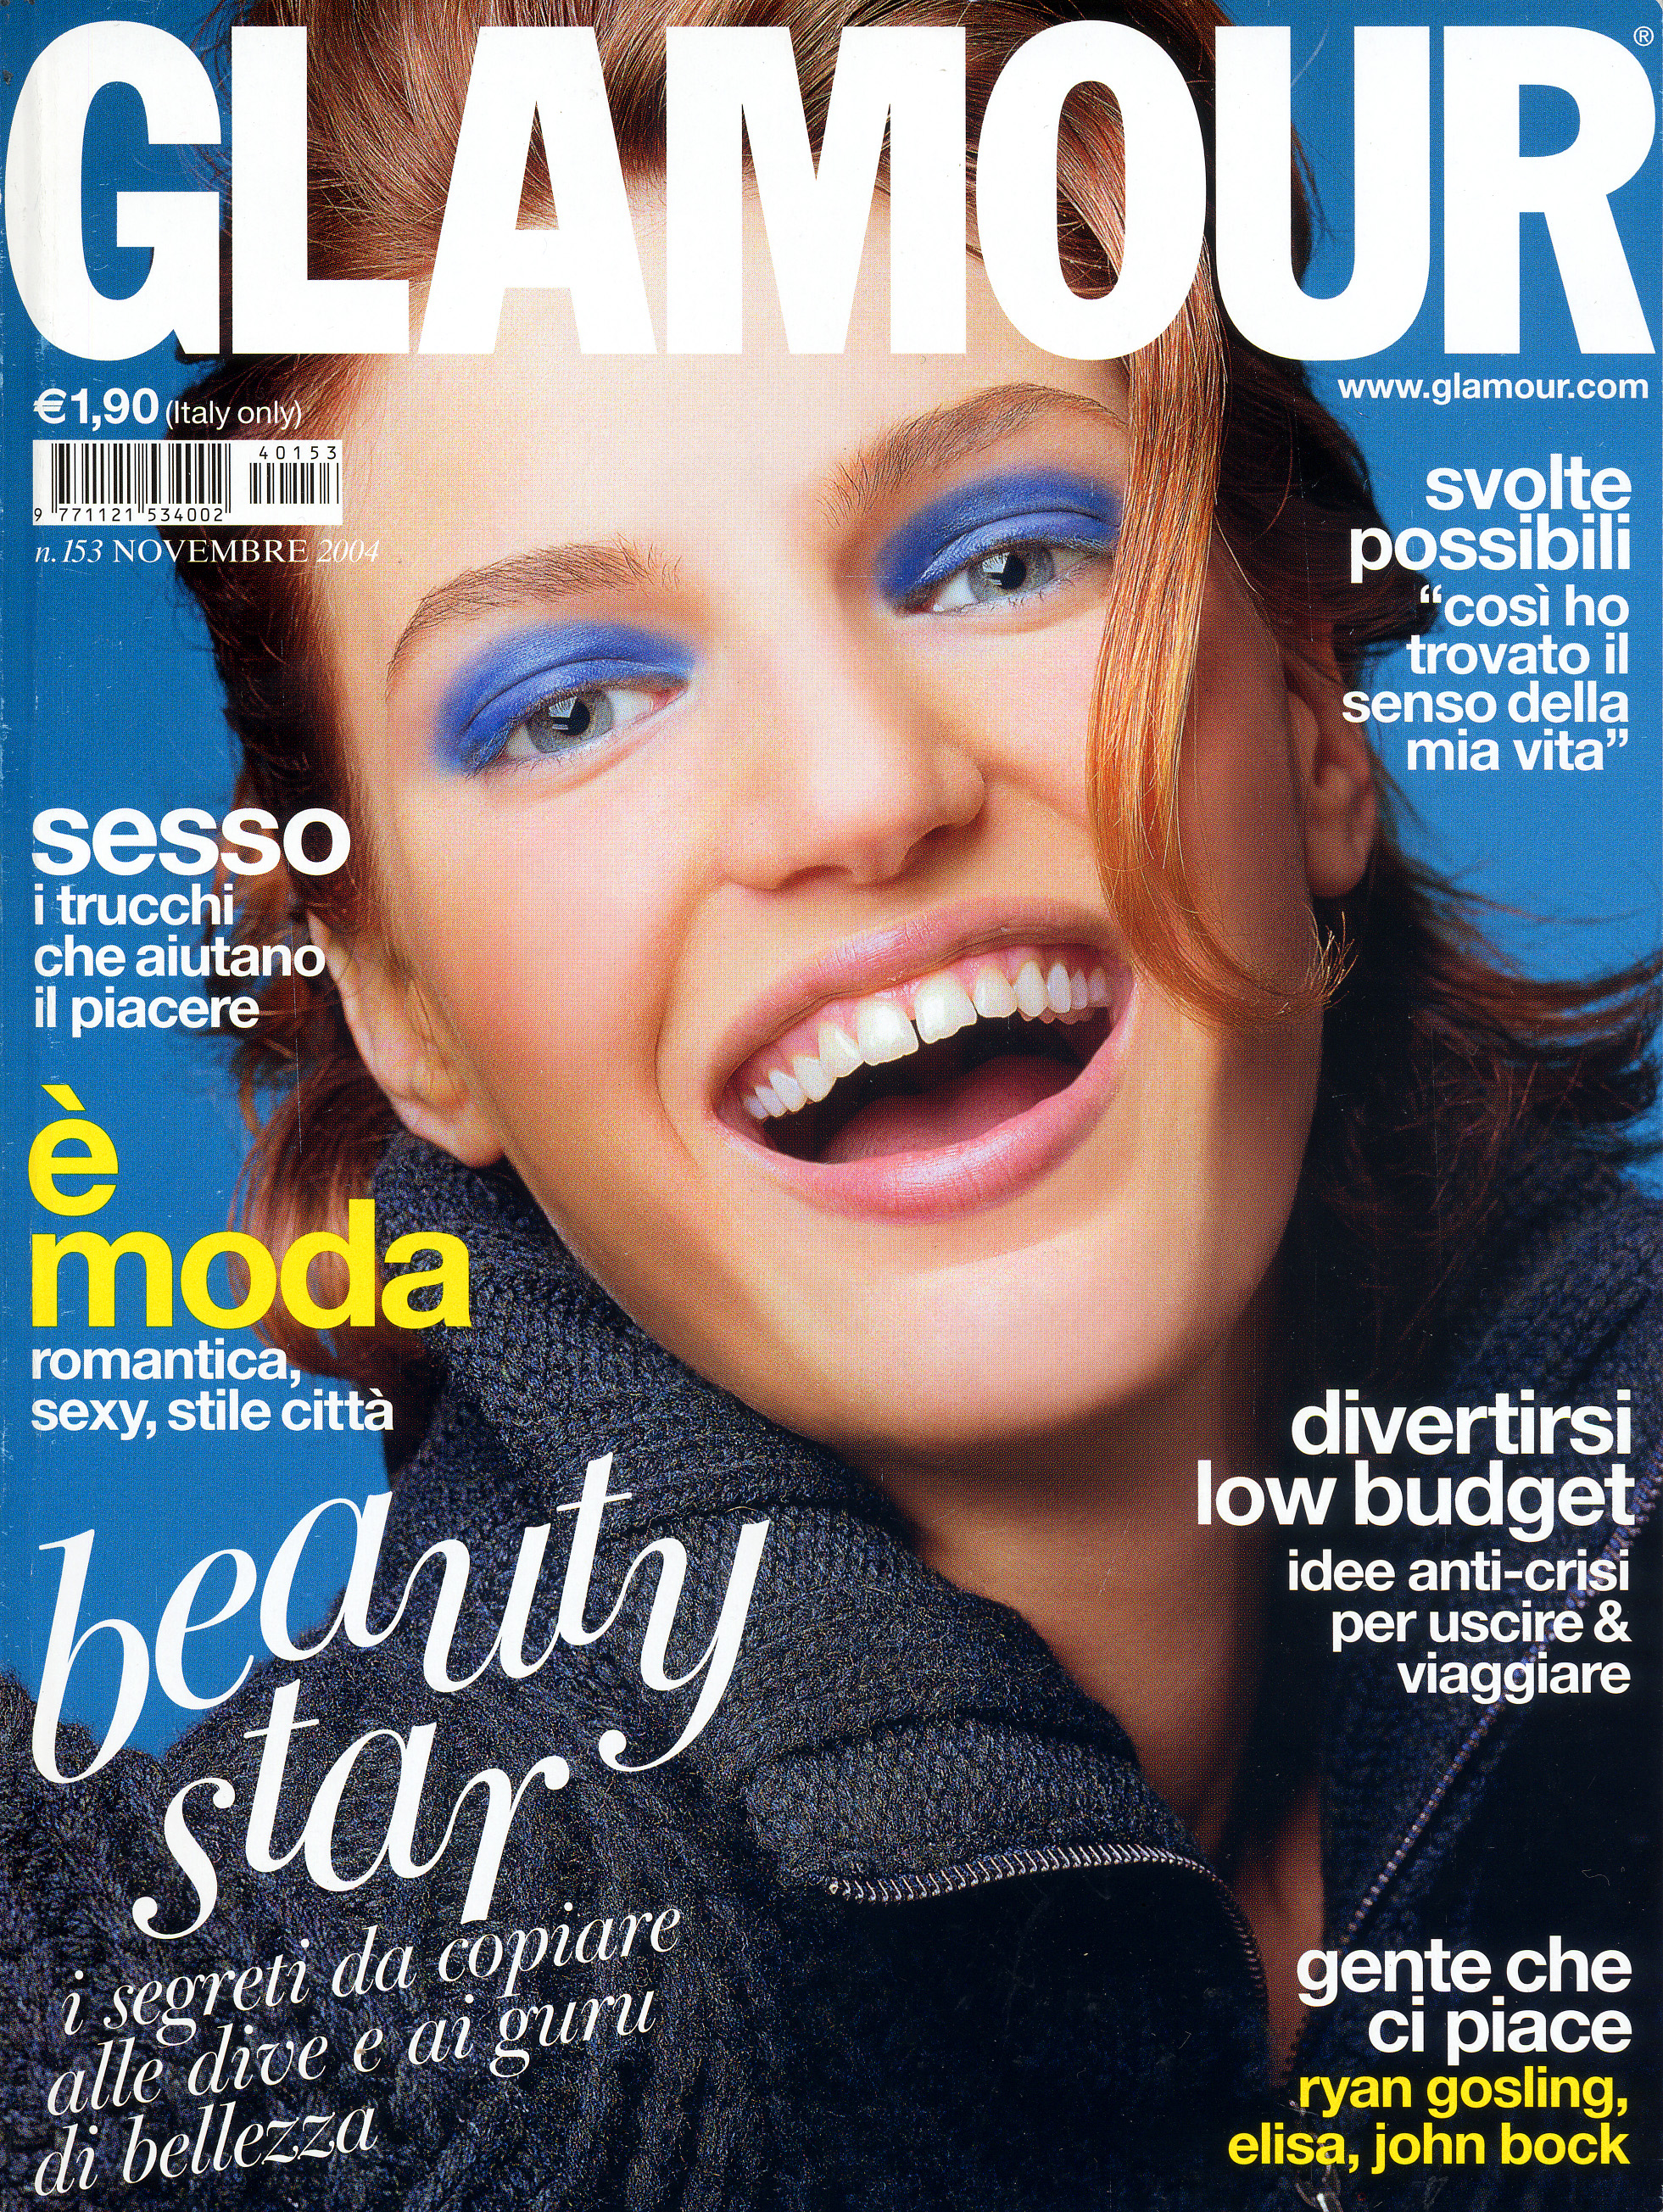 glamour+novembre04.JPG